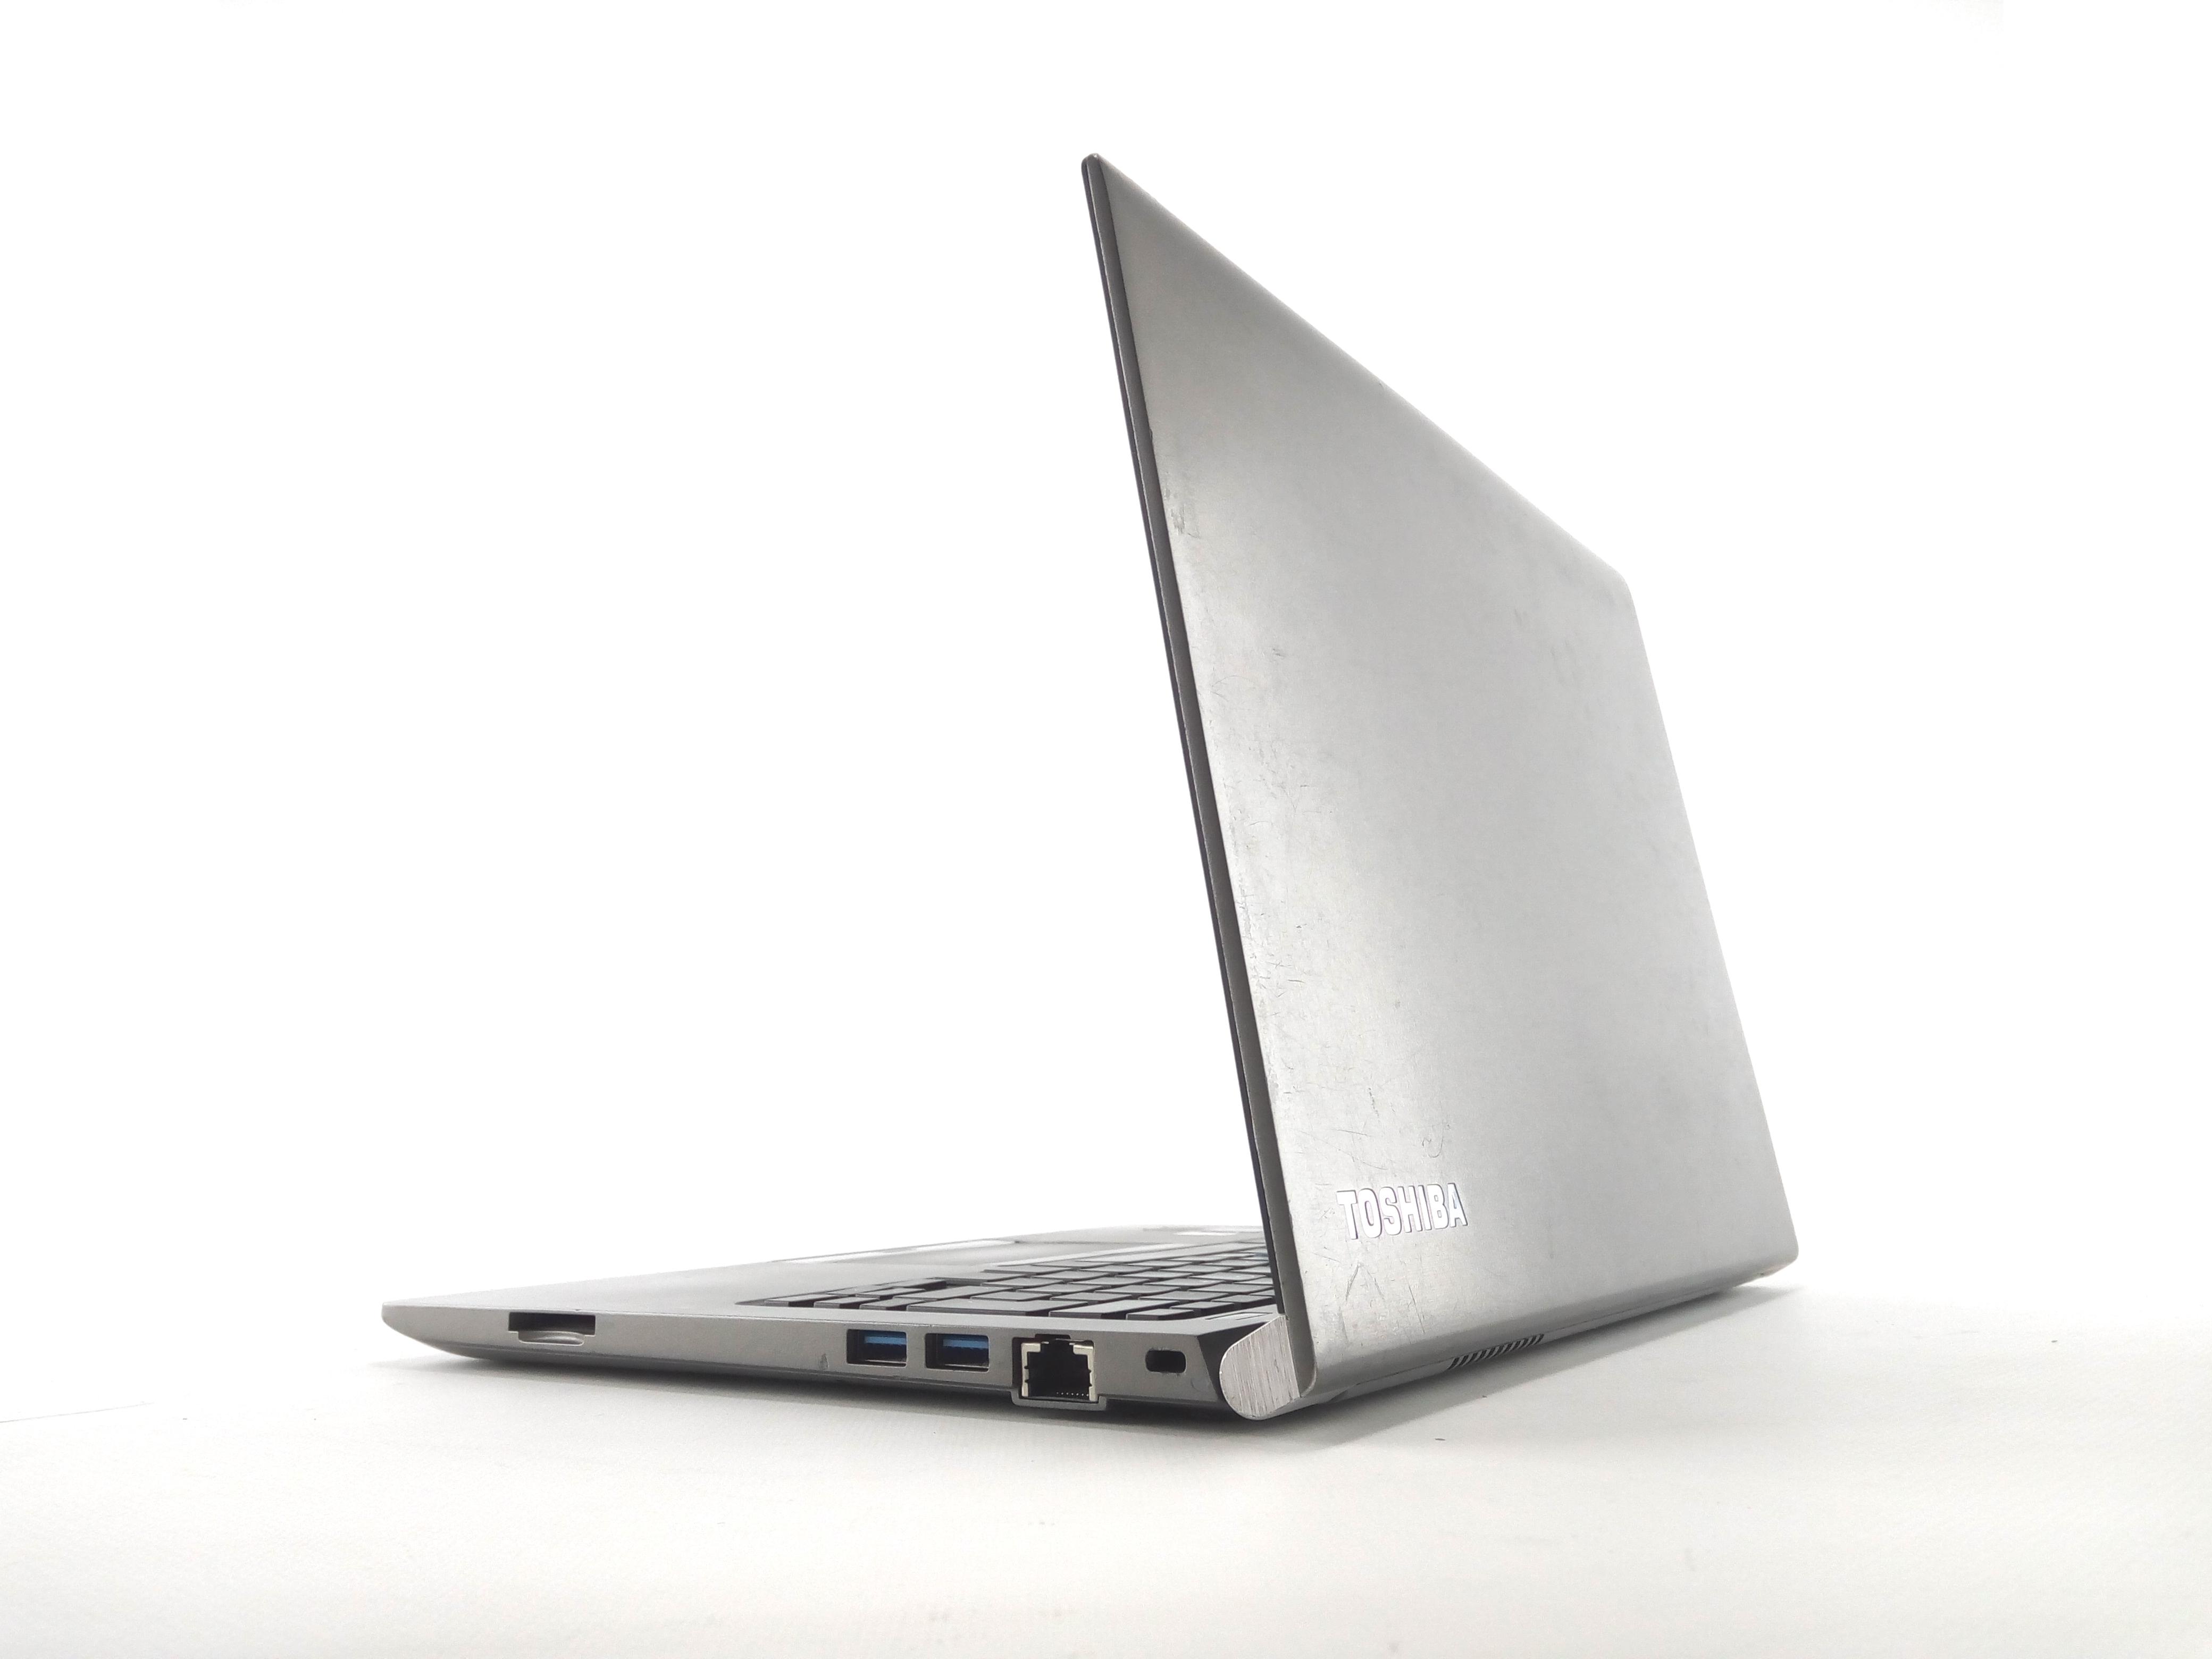 Ноутбук Toshiba Portege Z30-A 13 3 Intel Core i5 4200U